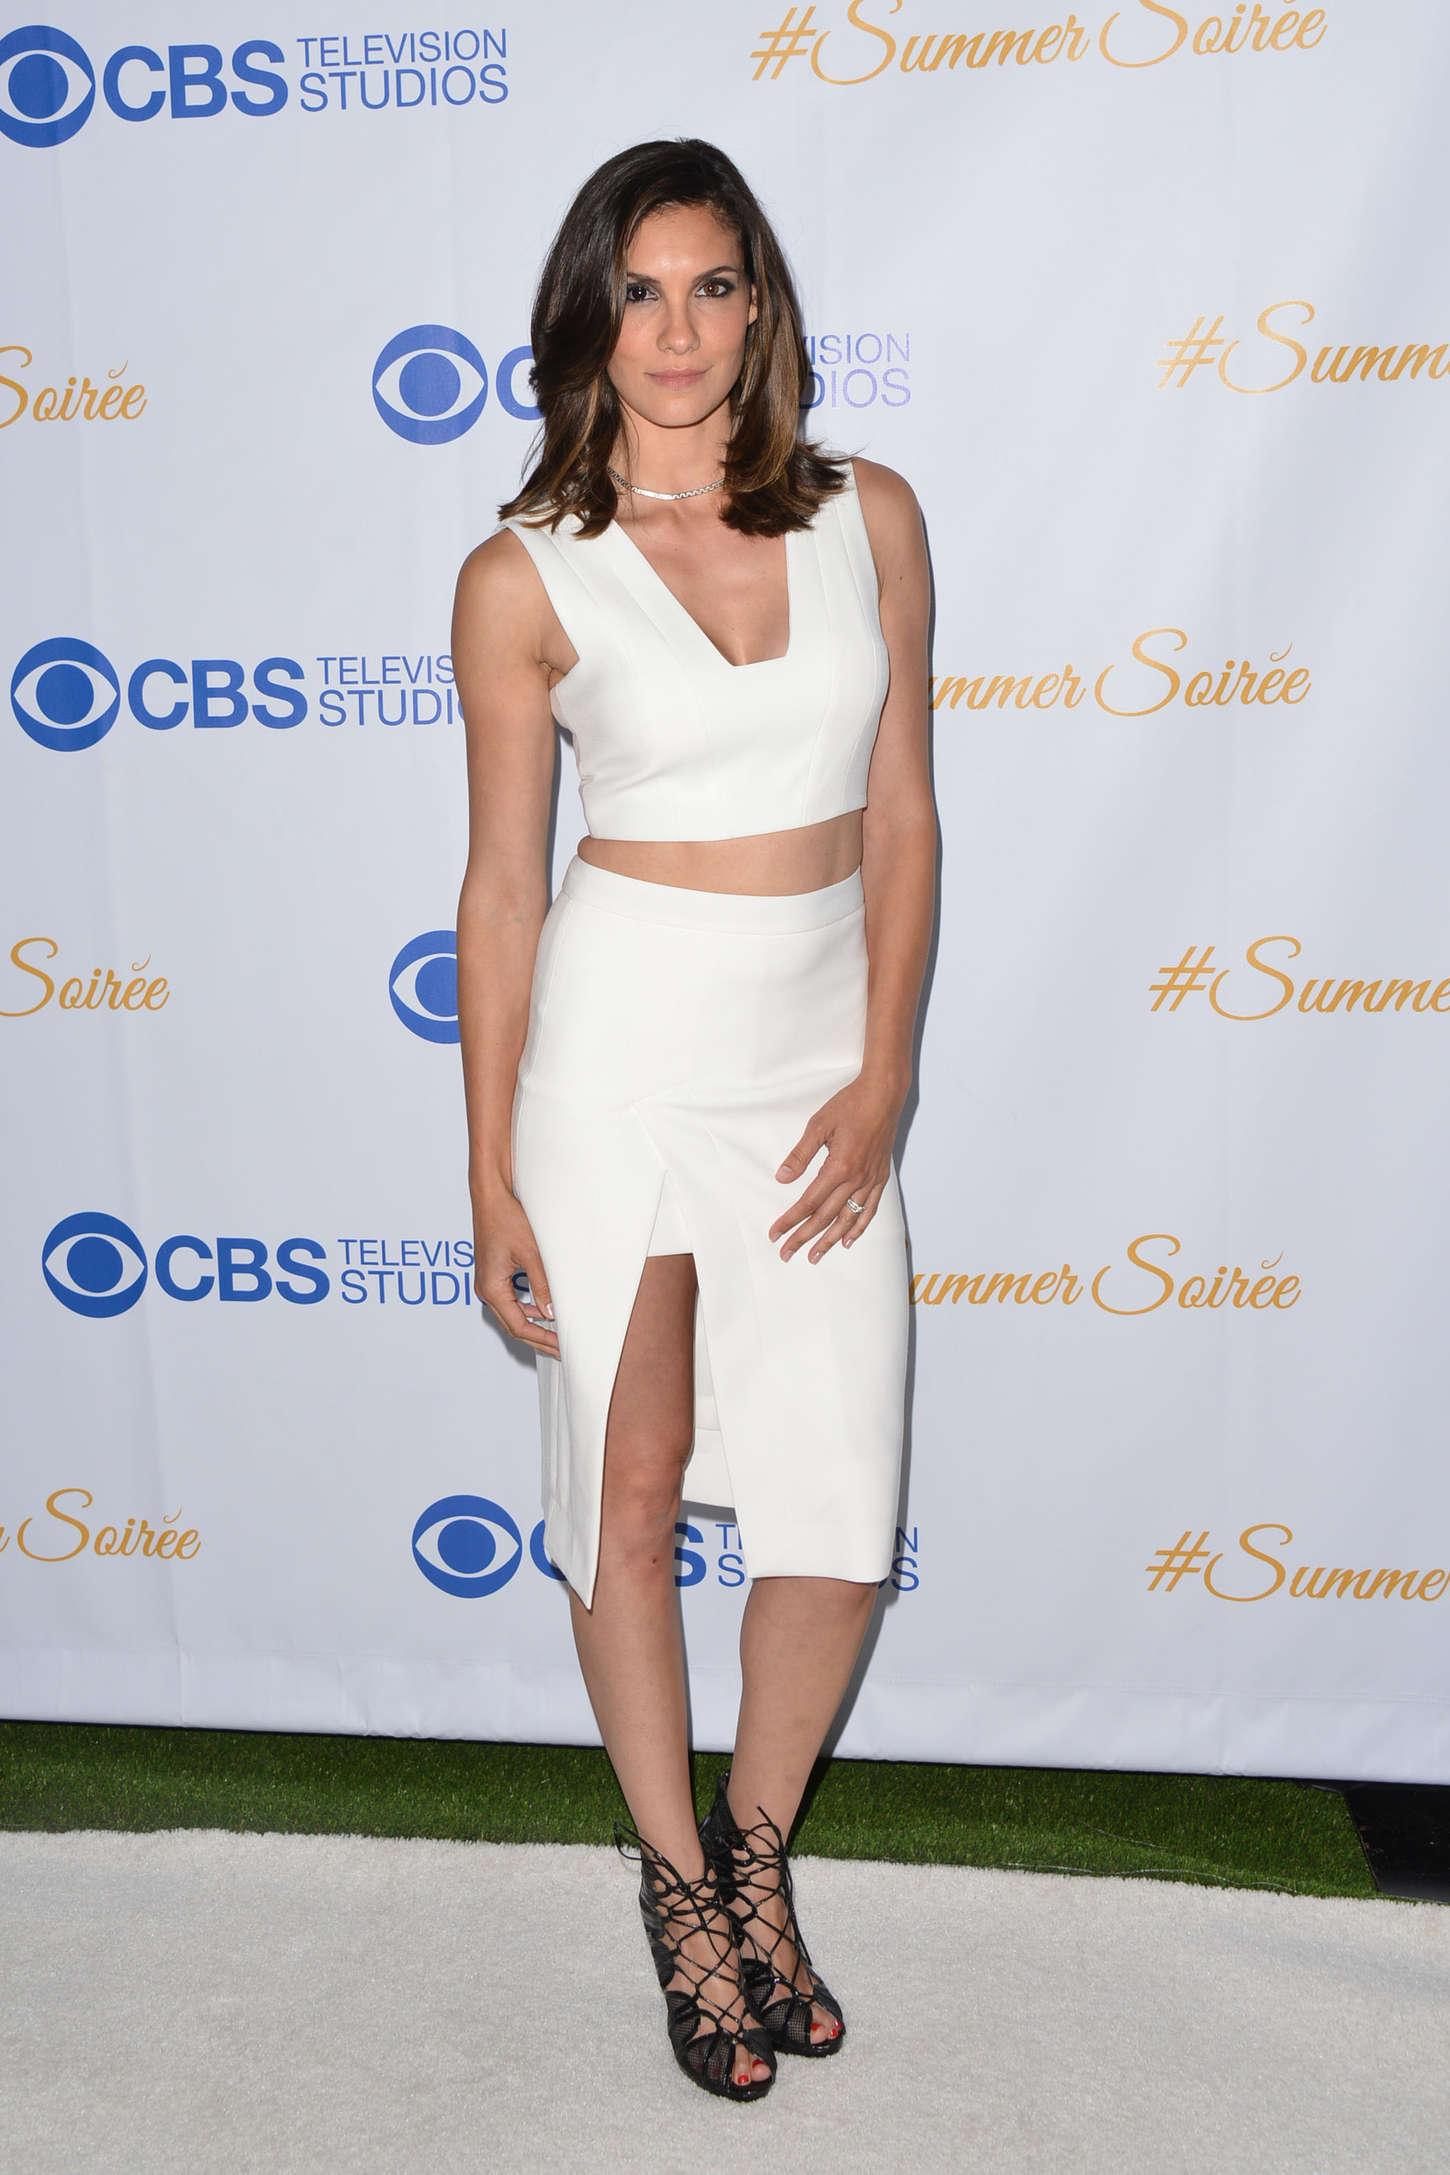 Daniela Ruah The CBS Television Studios Annual Summer Soiree in West Hollywood